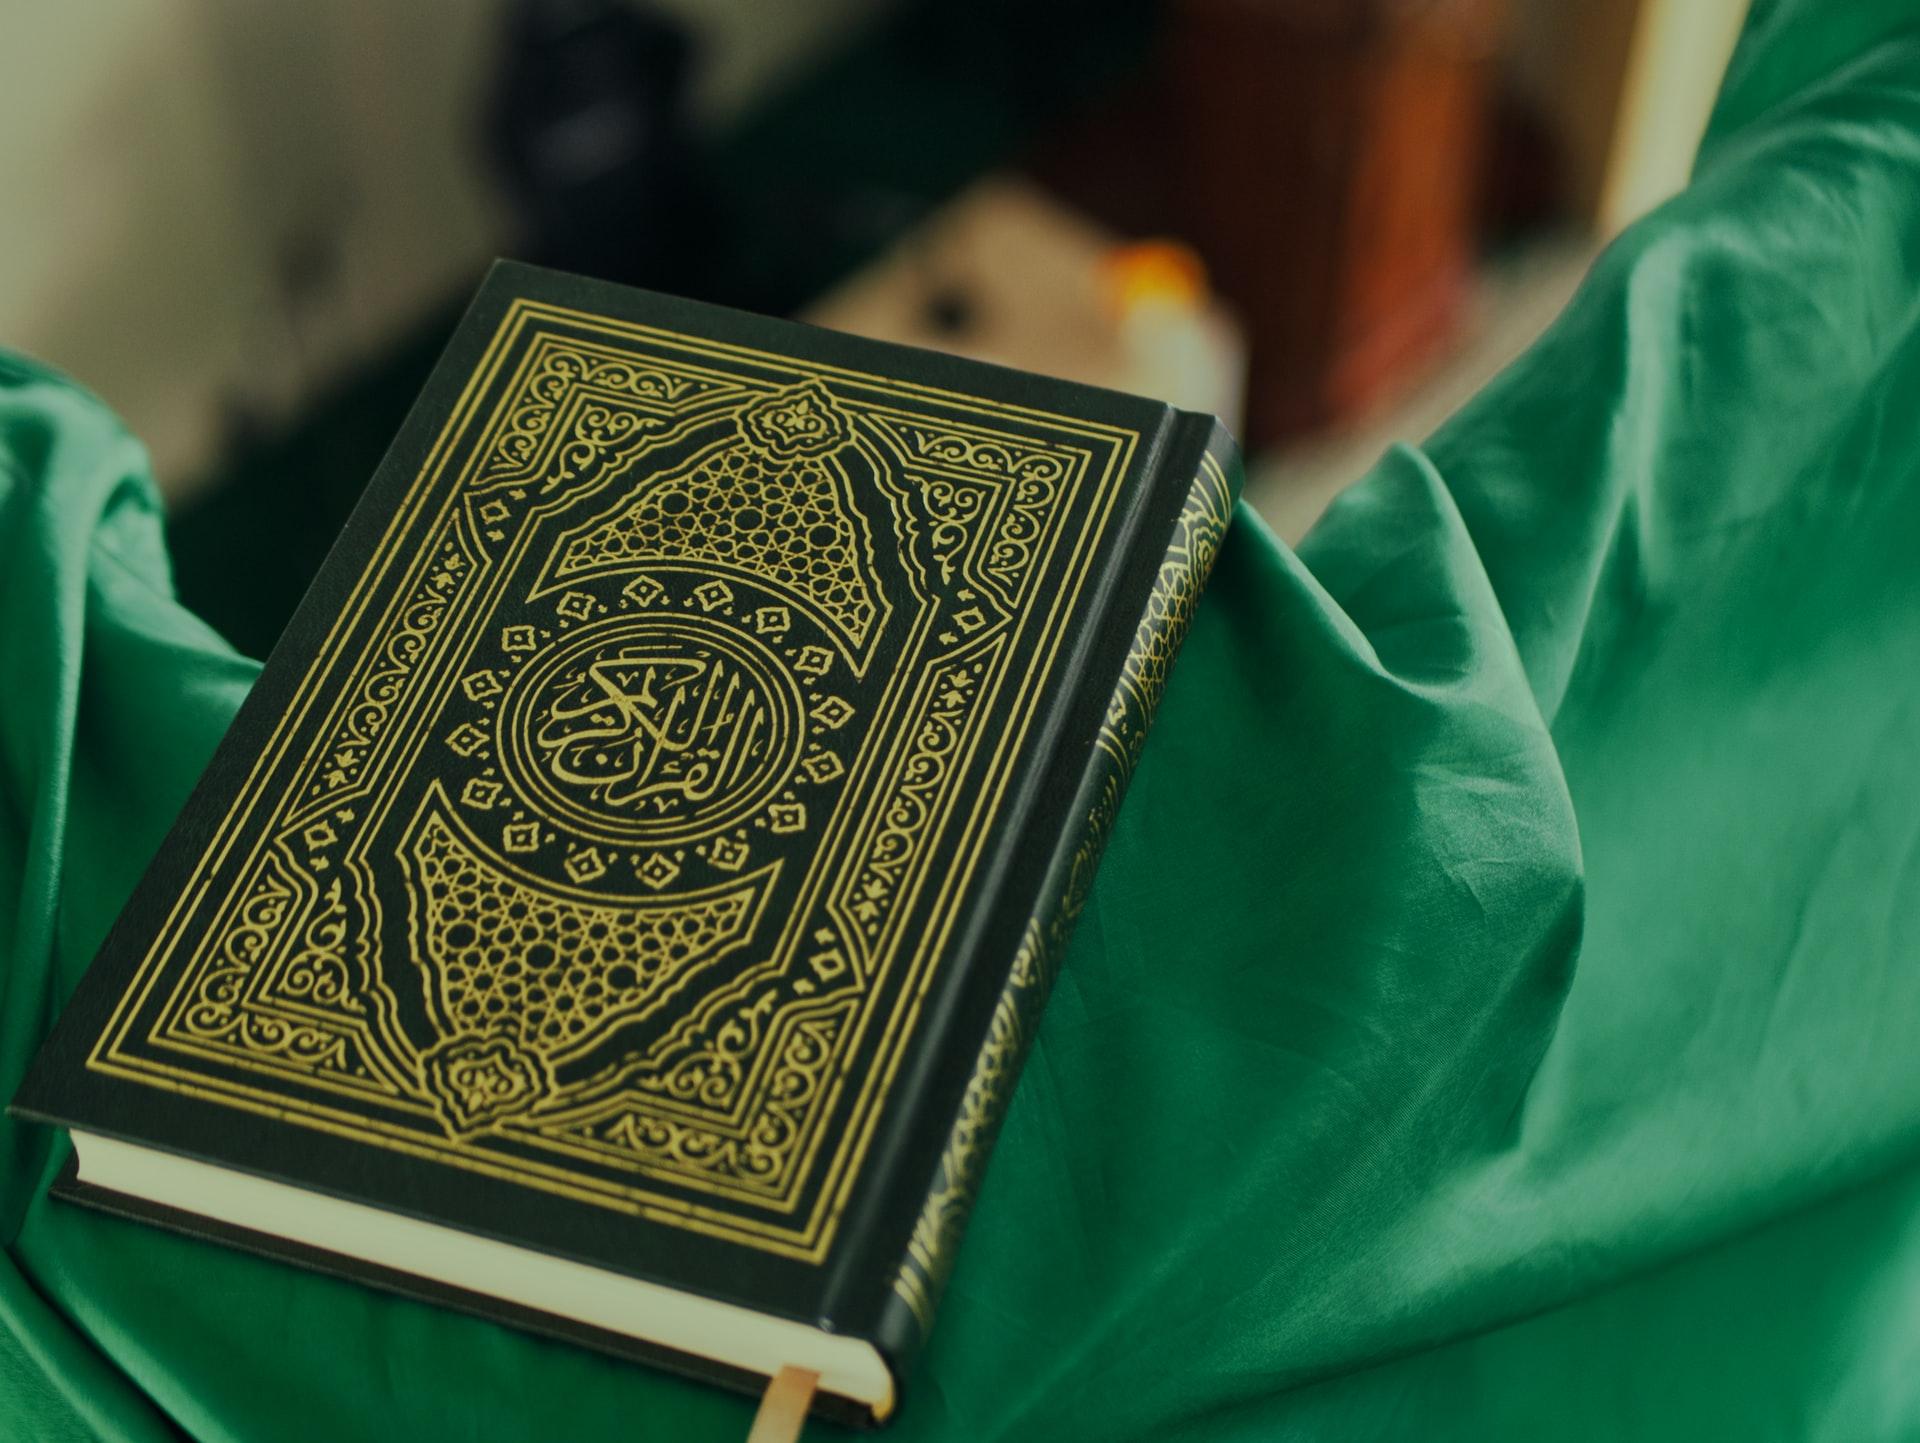 6 Agustus 610: Nabi Muhammad Menerima Wahyu Pertama